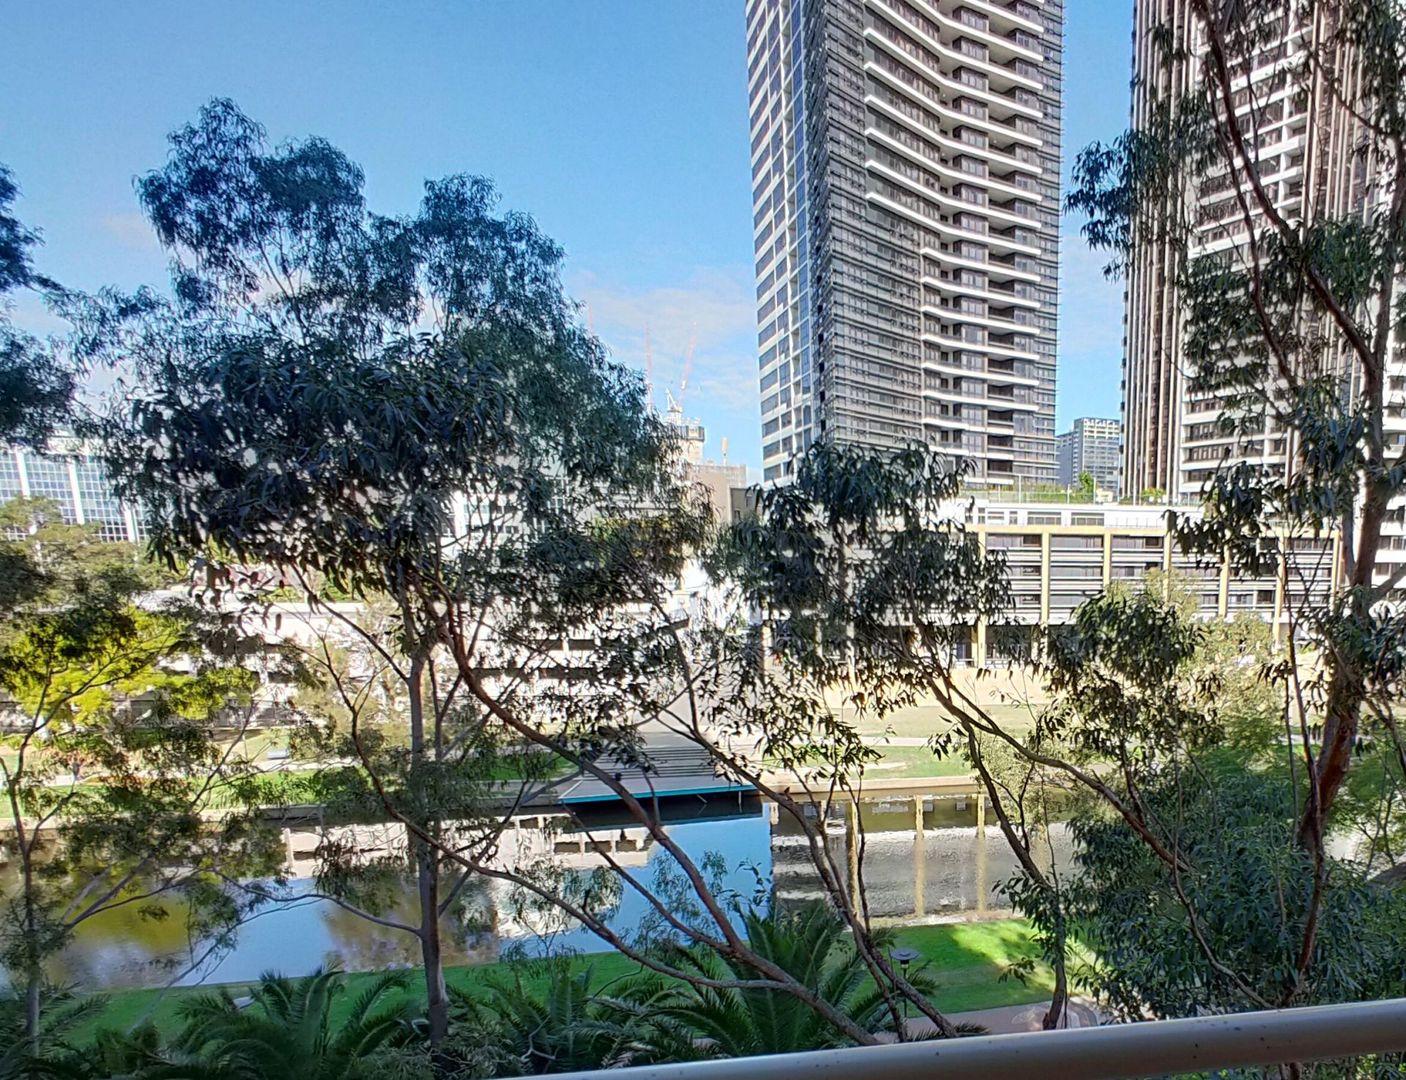 43/3 SORRELL STREET, Parramatta NSW 2150, Image 2